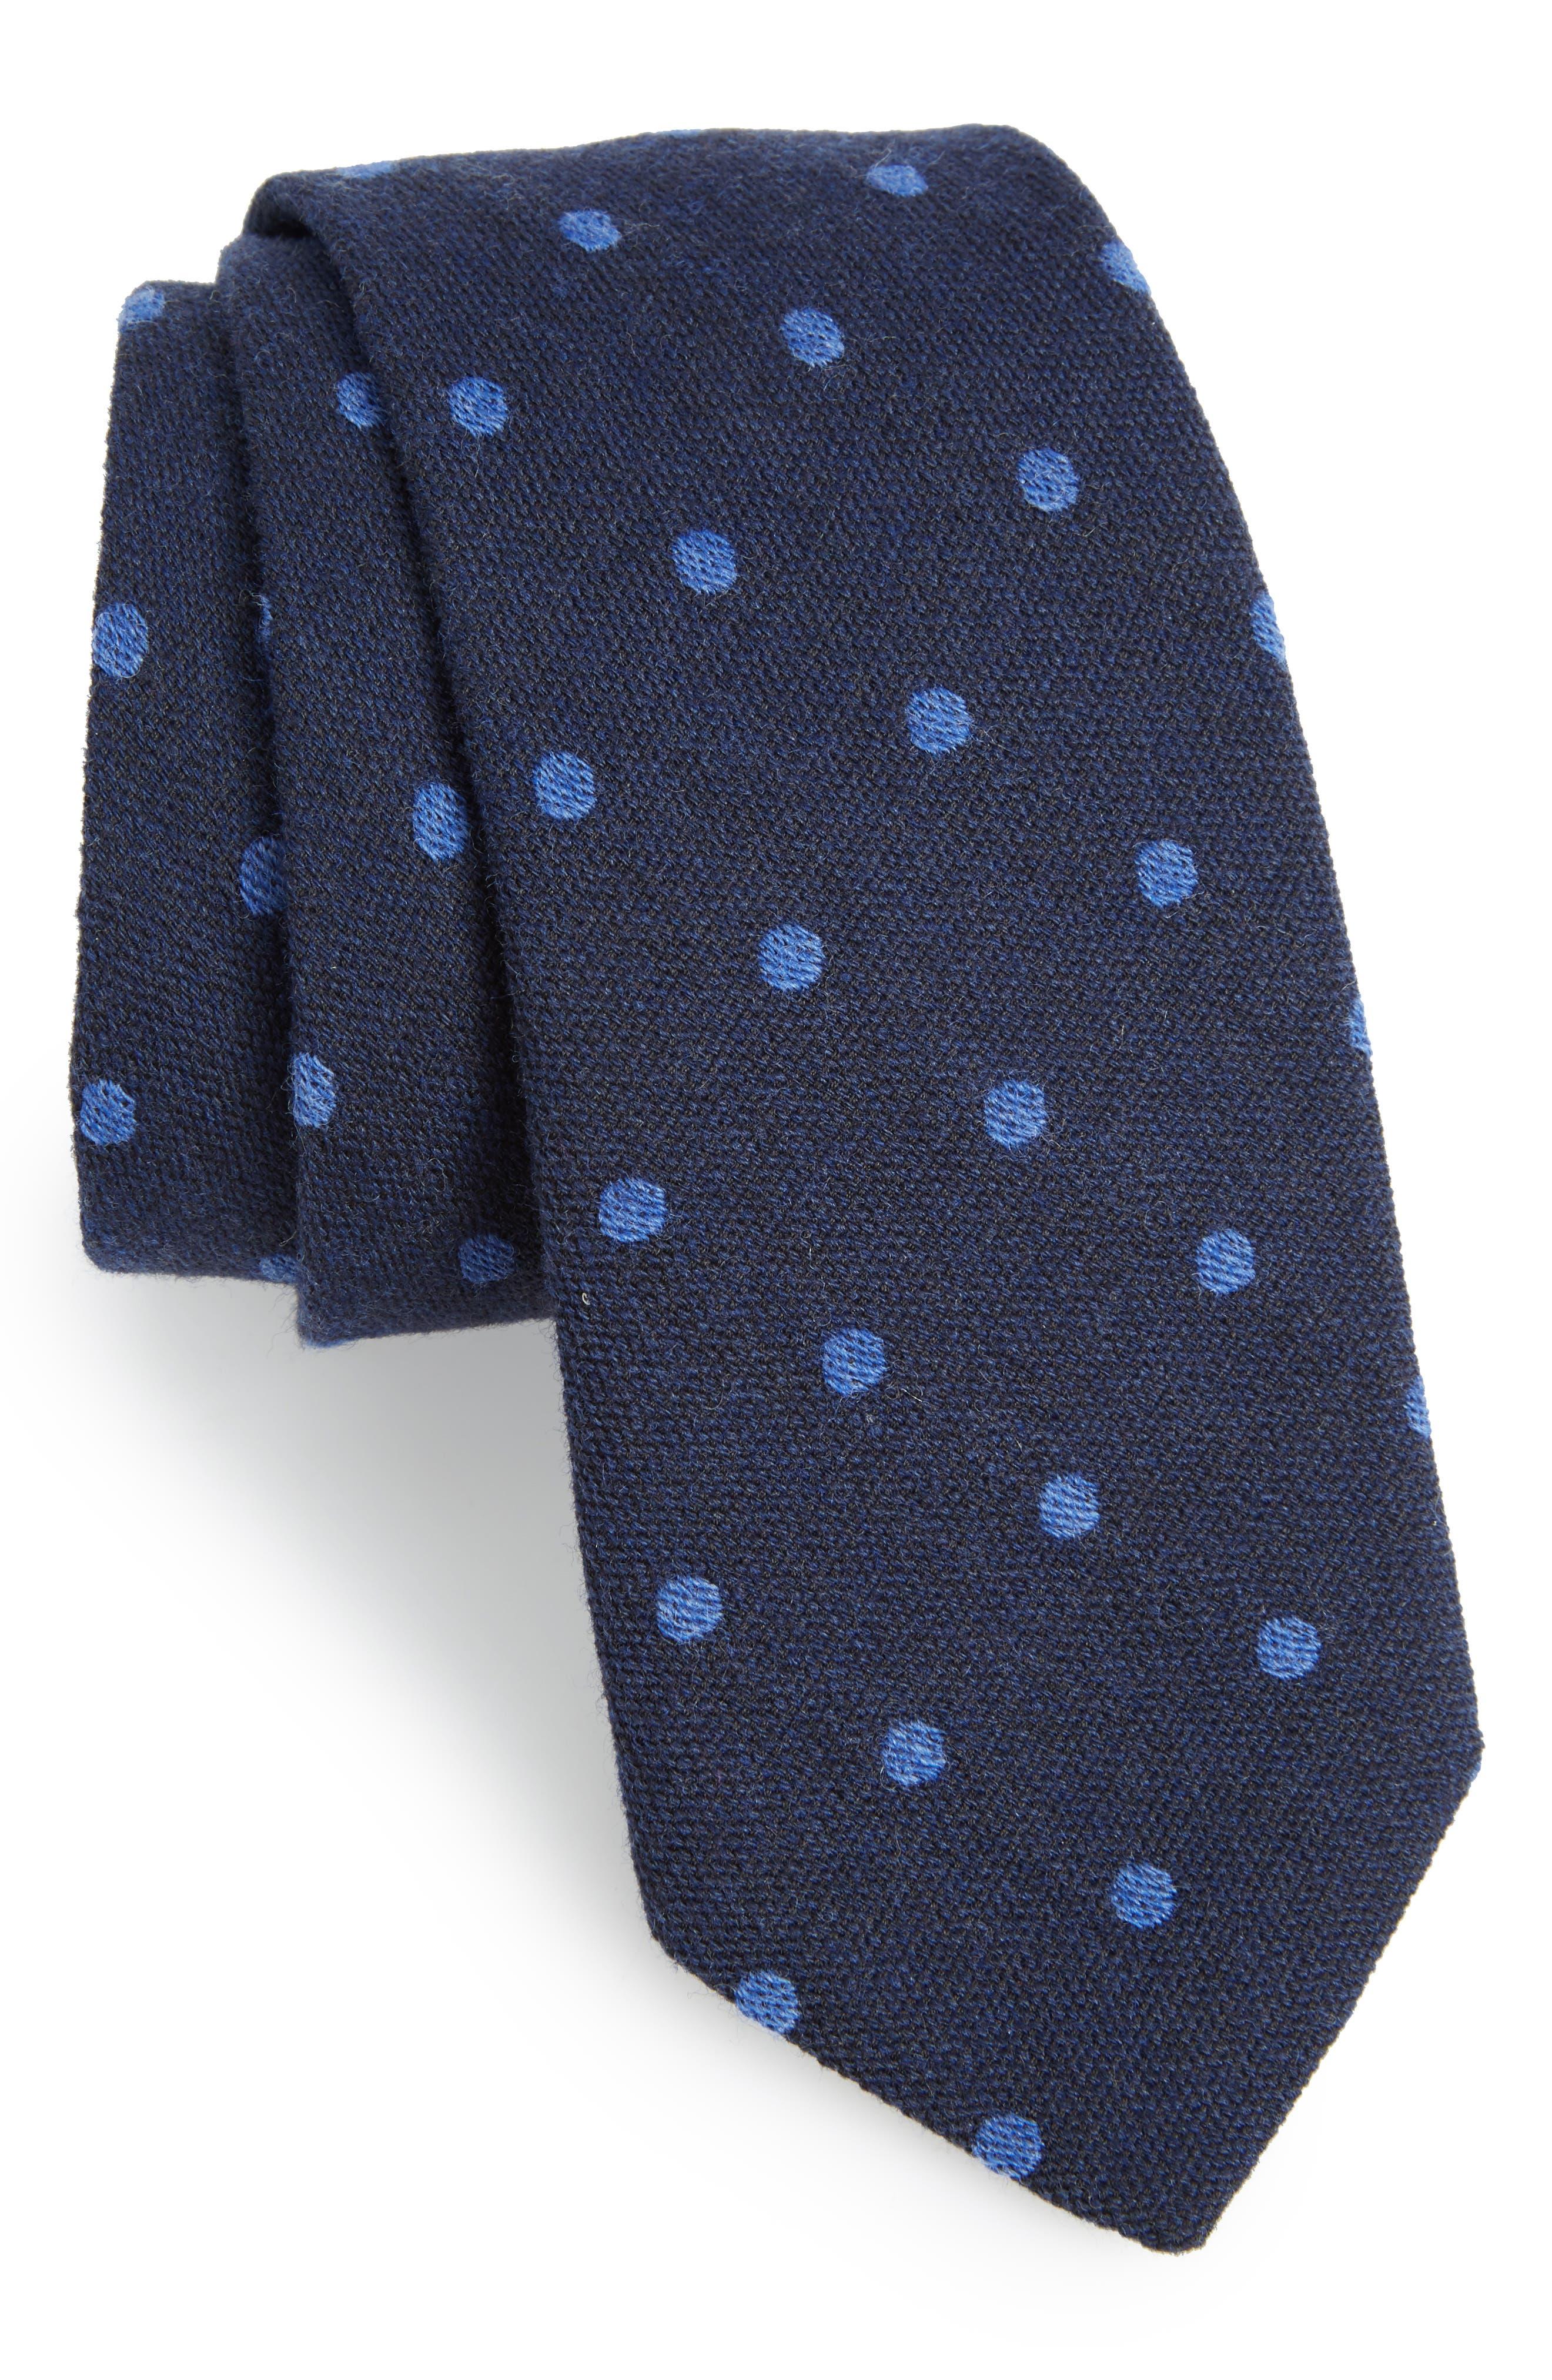 Main Image - Bonobos Newell Dot Wool Tie